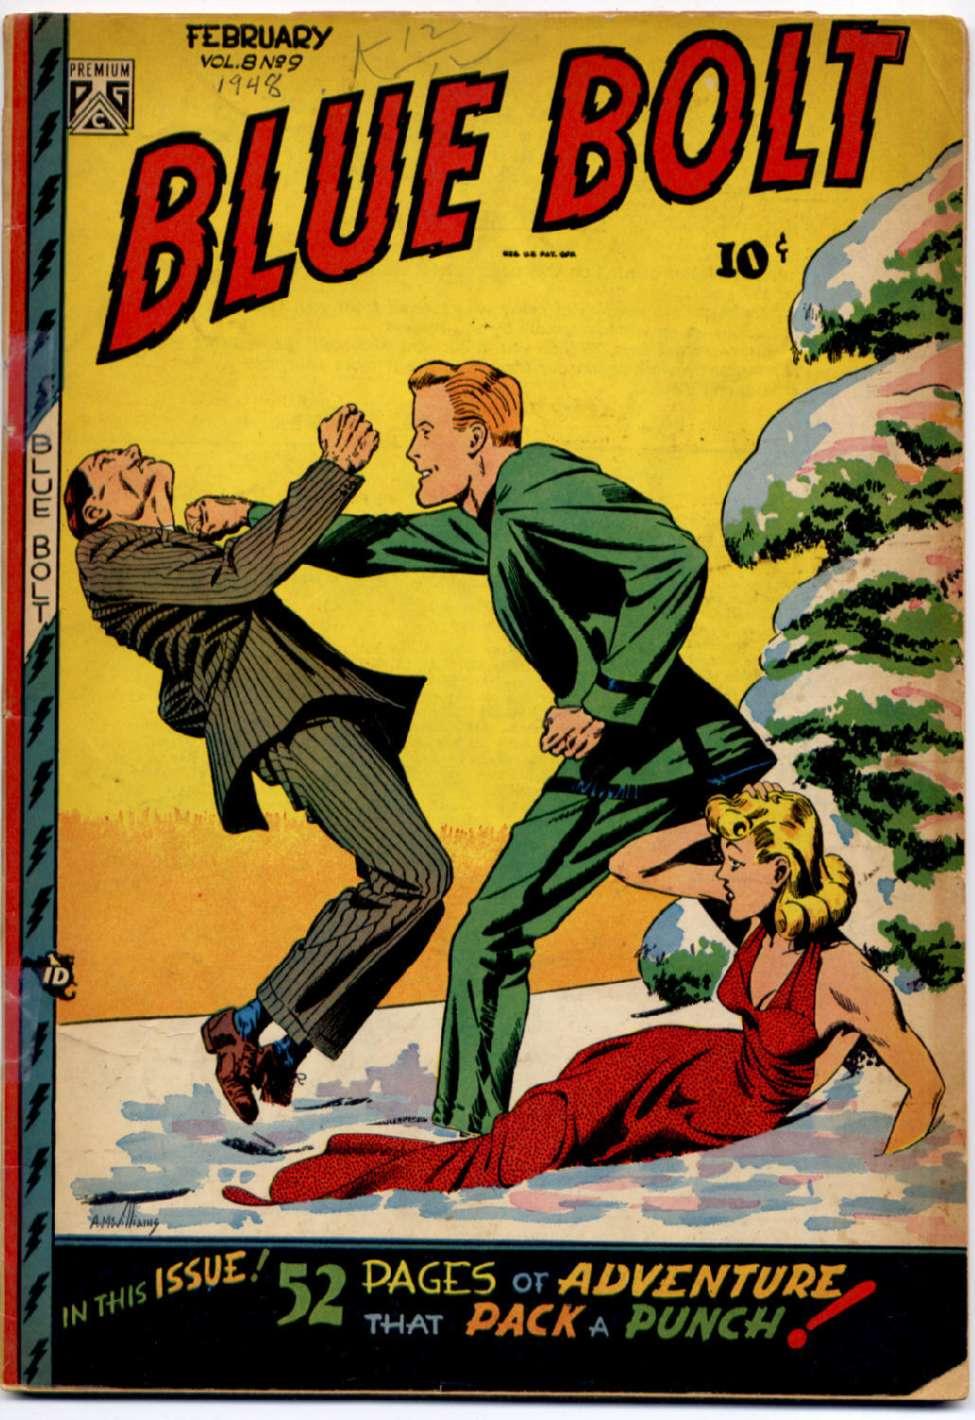 Blue Bolt v8 #9, Novelty